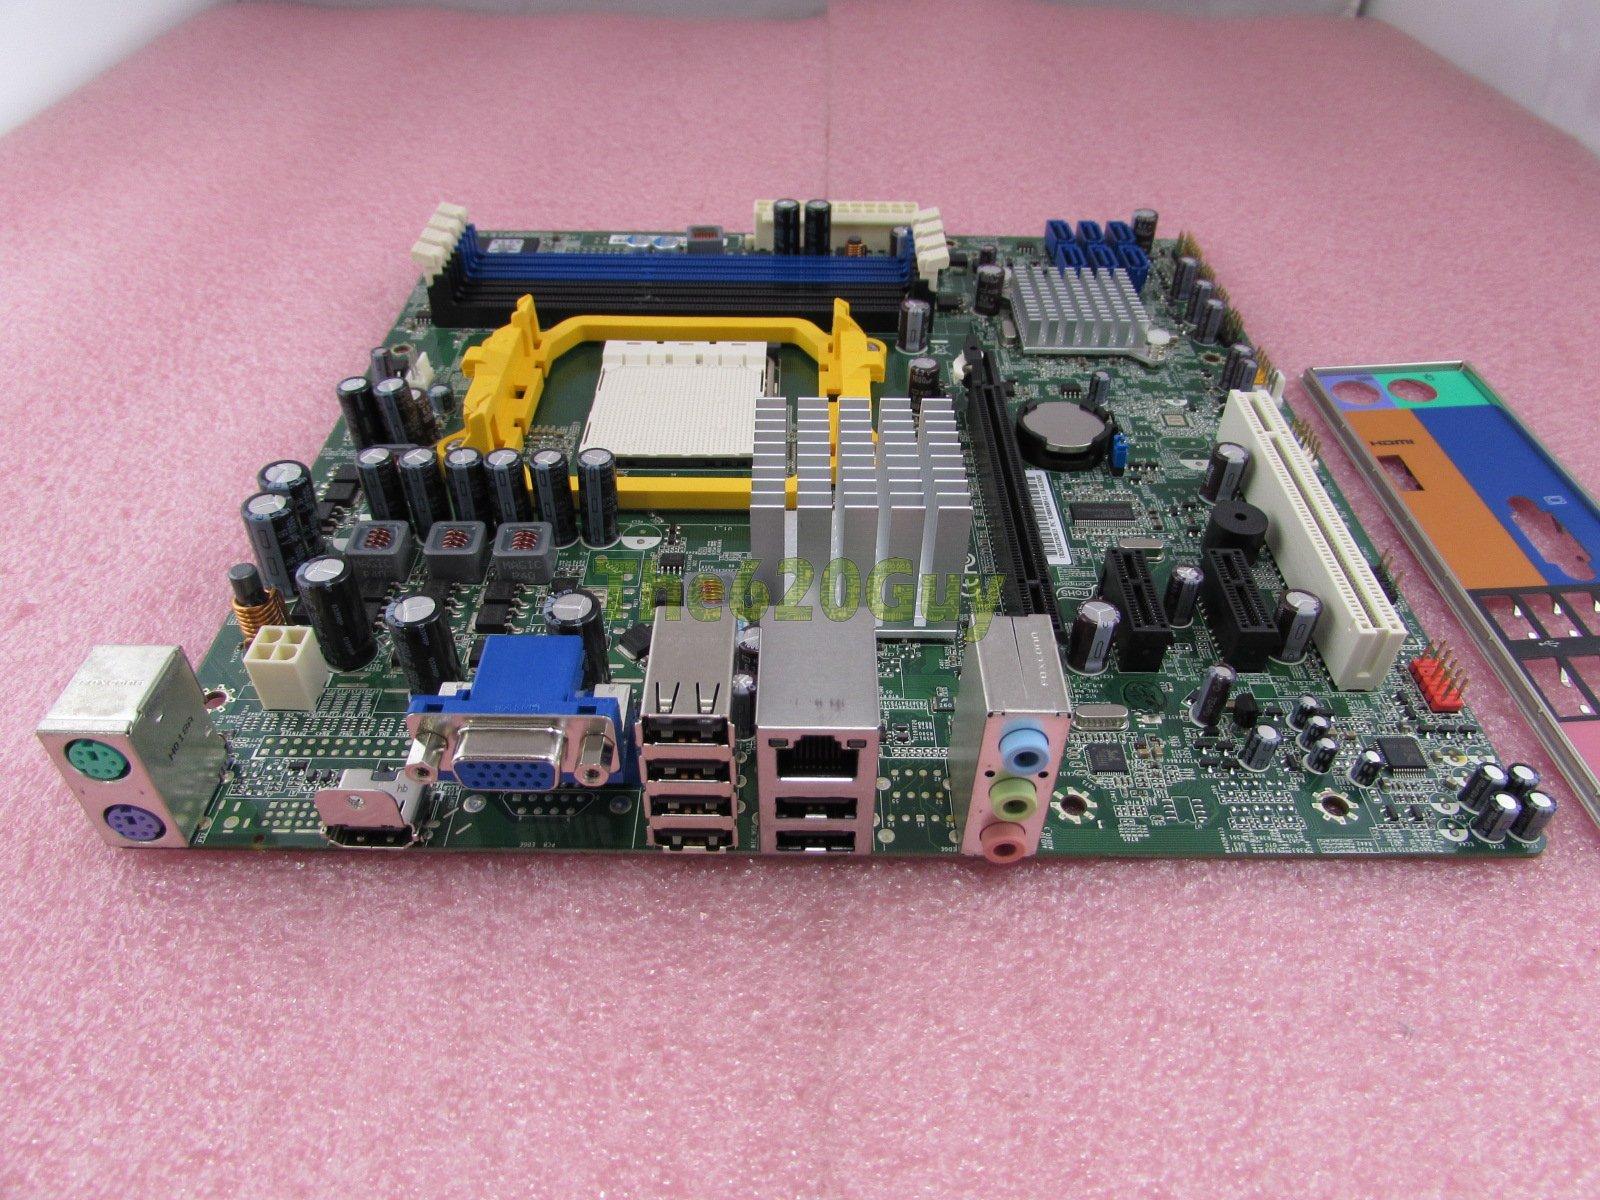 Acer Mcp73ve Motherboard Manual